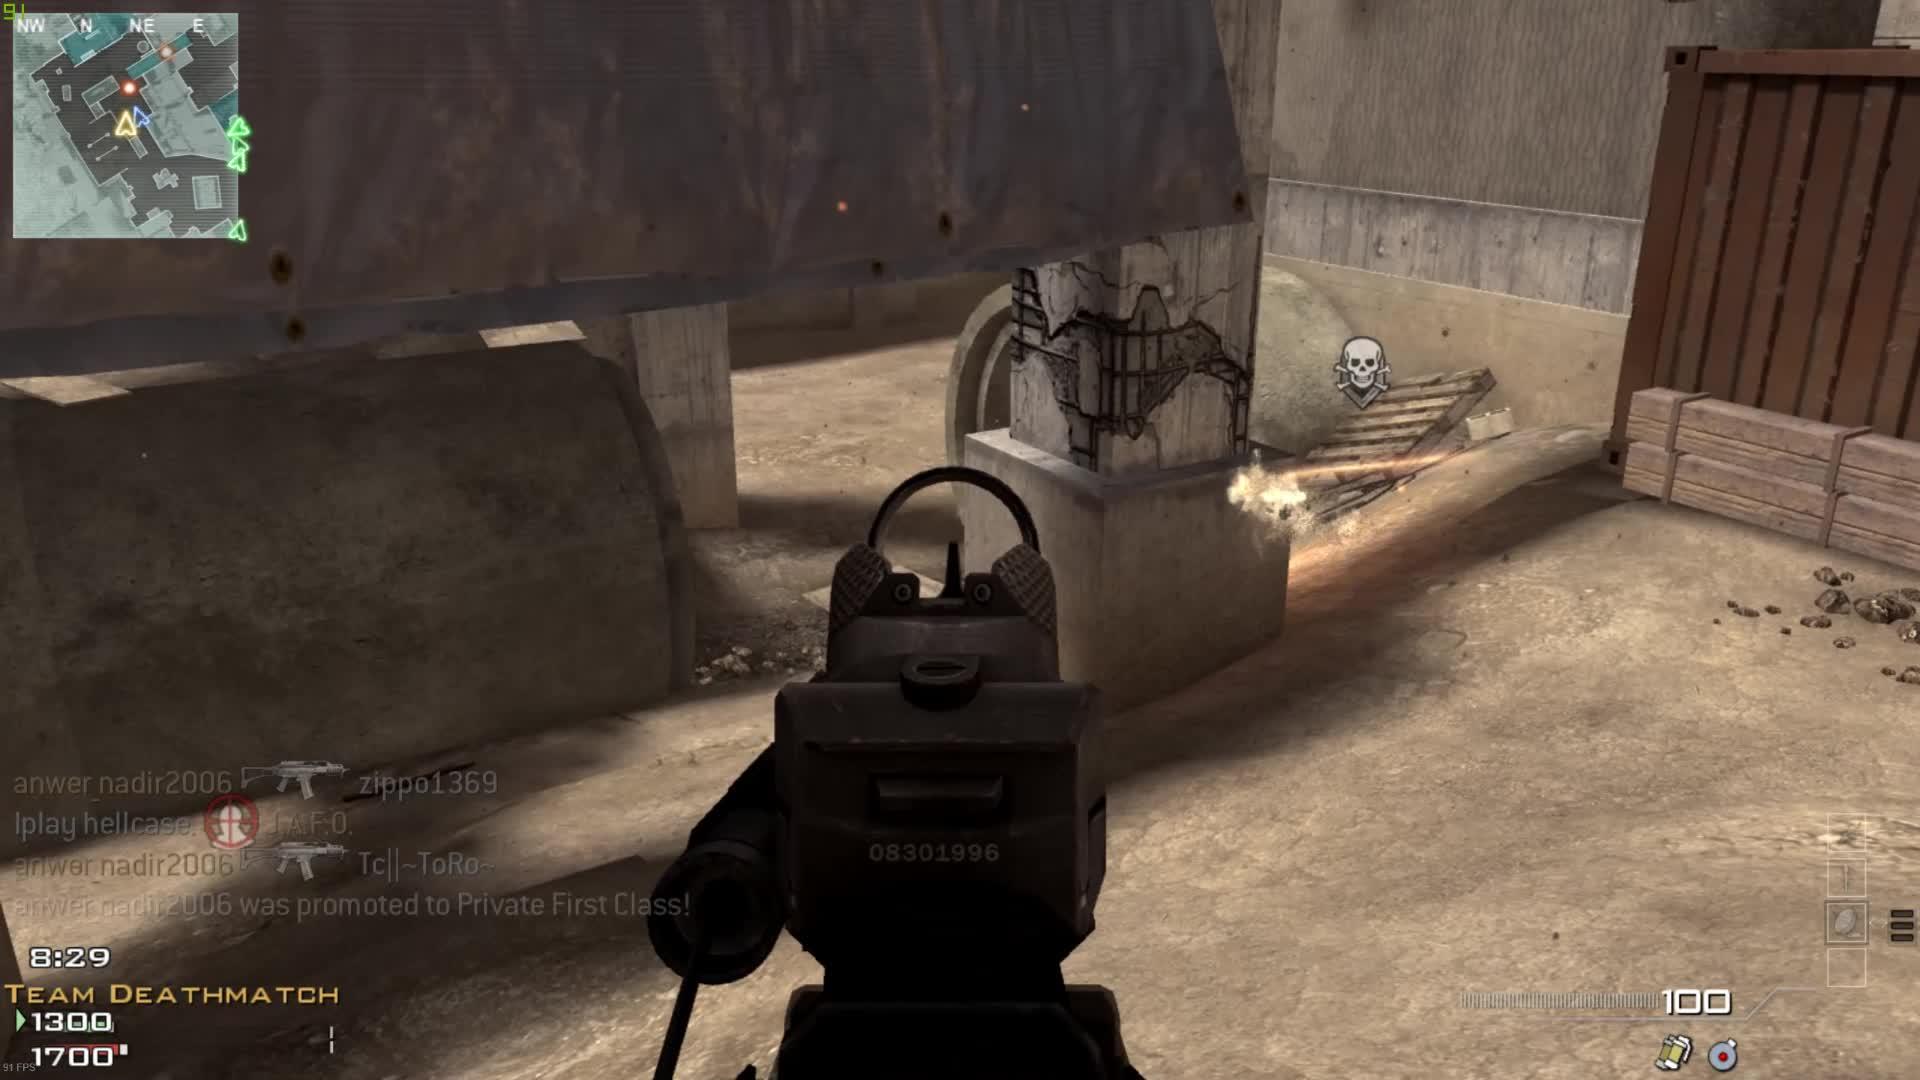 300 Modern Warfare 3 Battlefield 3 Tiozinho Gifs Search Search